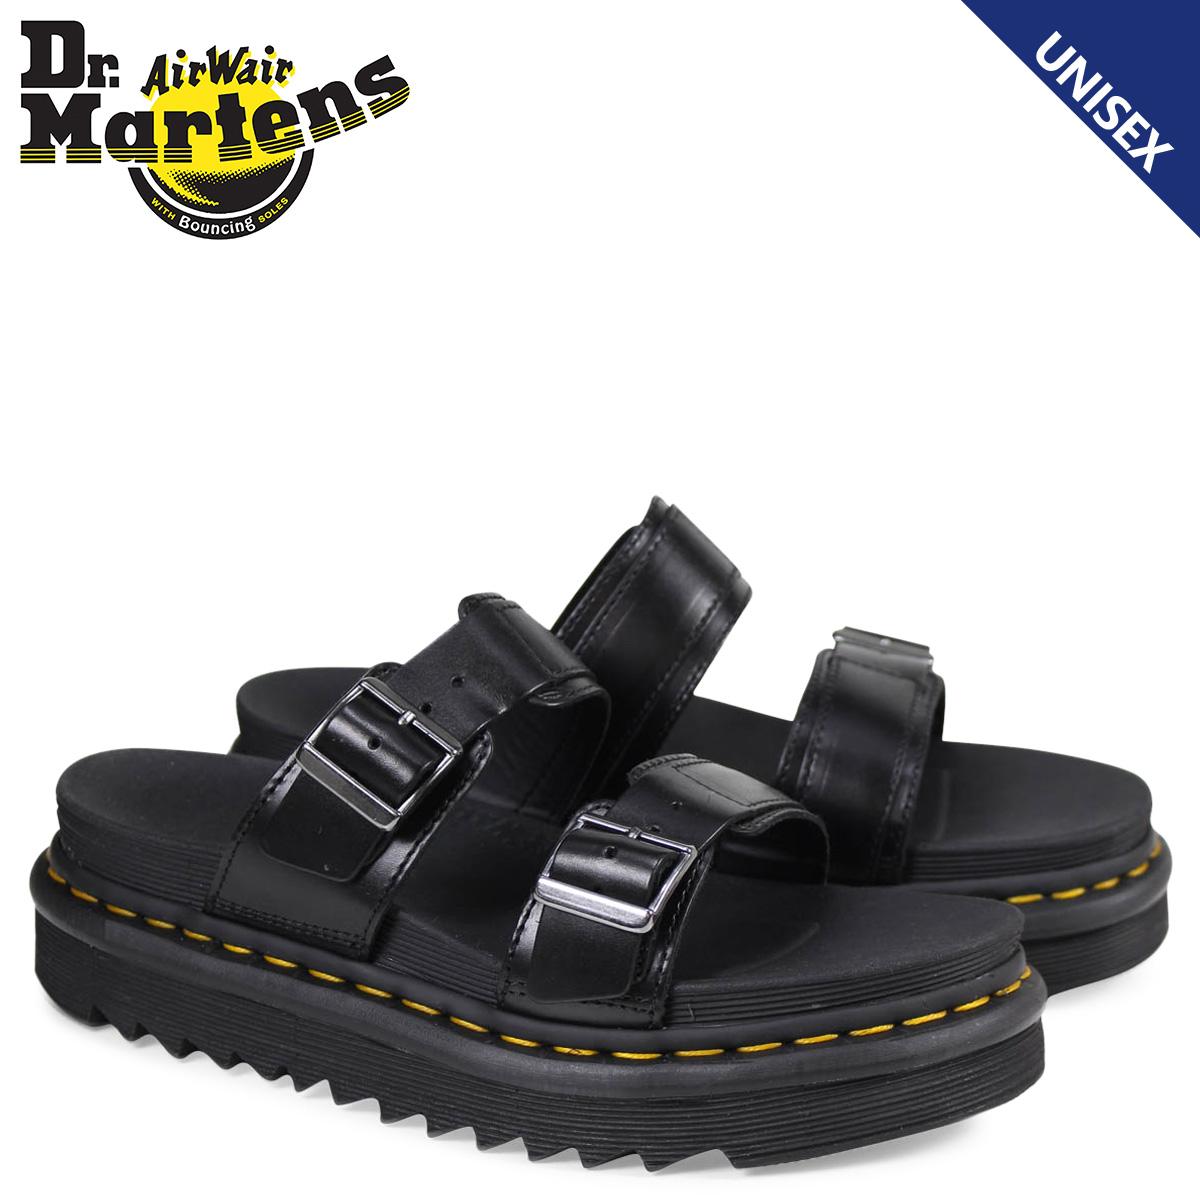 1d51ded95f1c31 Doctor Martin miles men gap Dis Dr.Martens sandals MYLES SANDAL black  R23523001  2 14 Shinnyu load